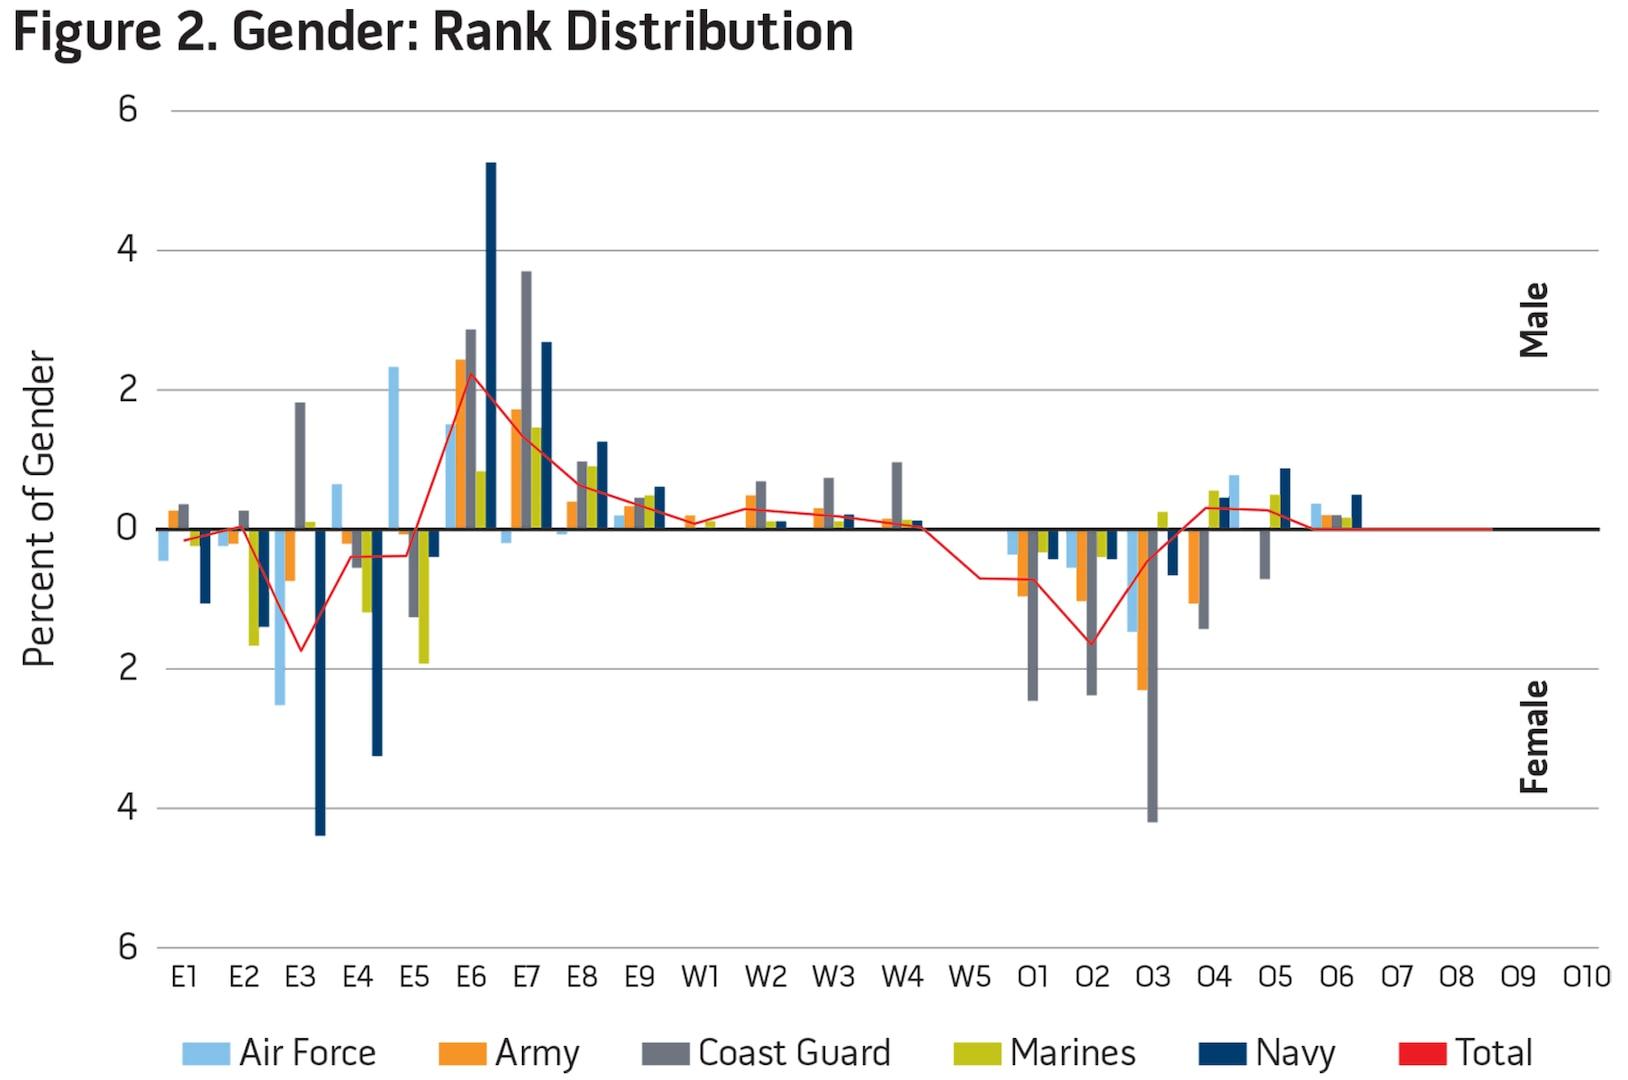 Figure 2. Gender: Rank Distribution